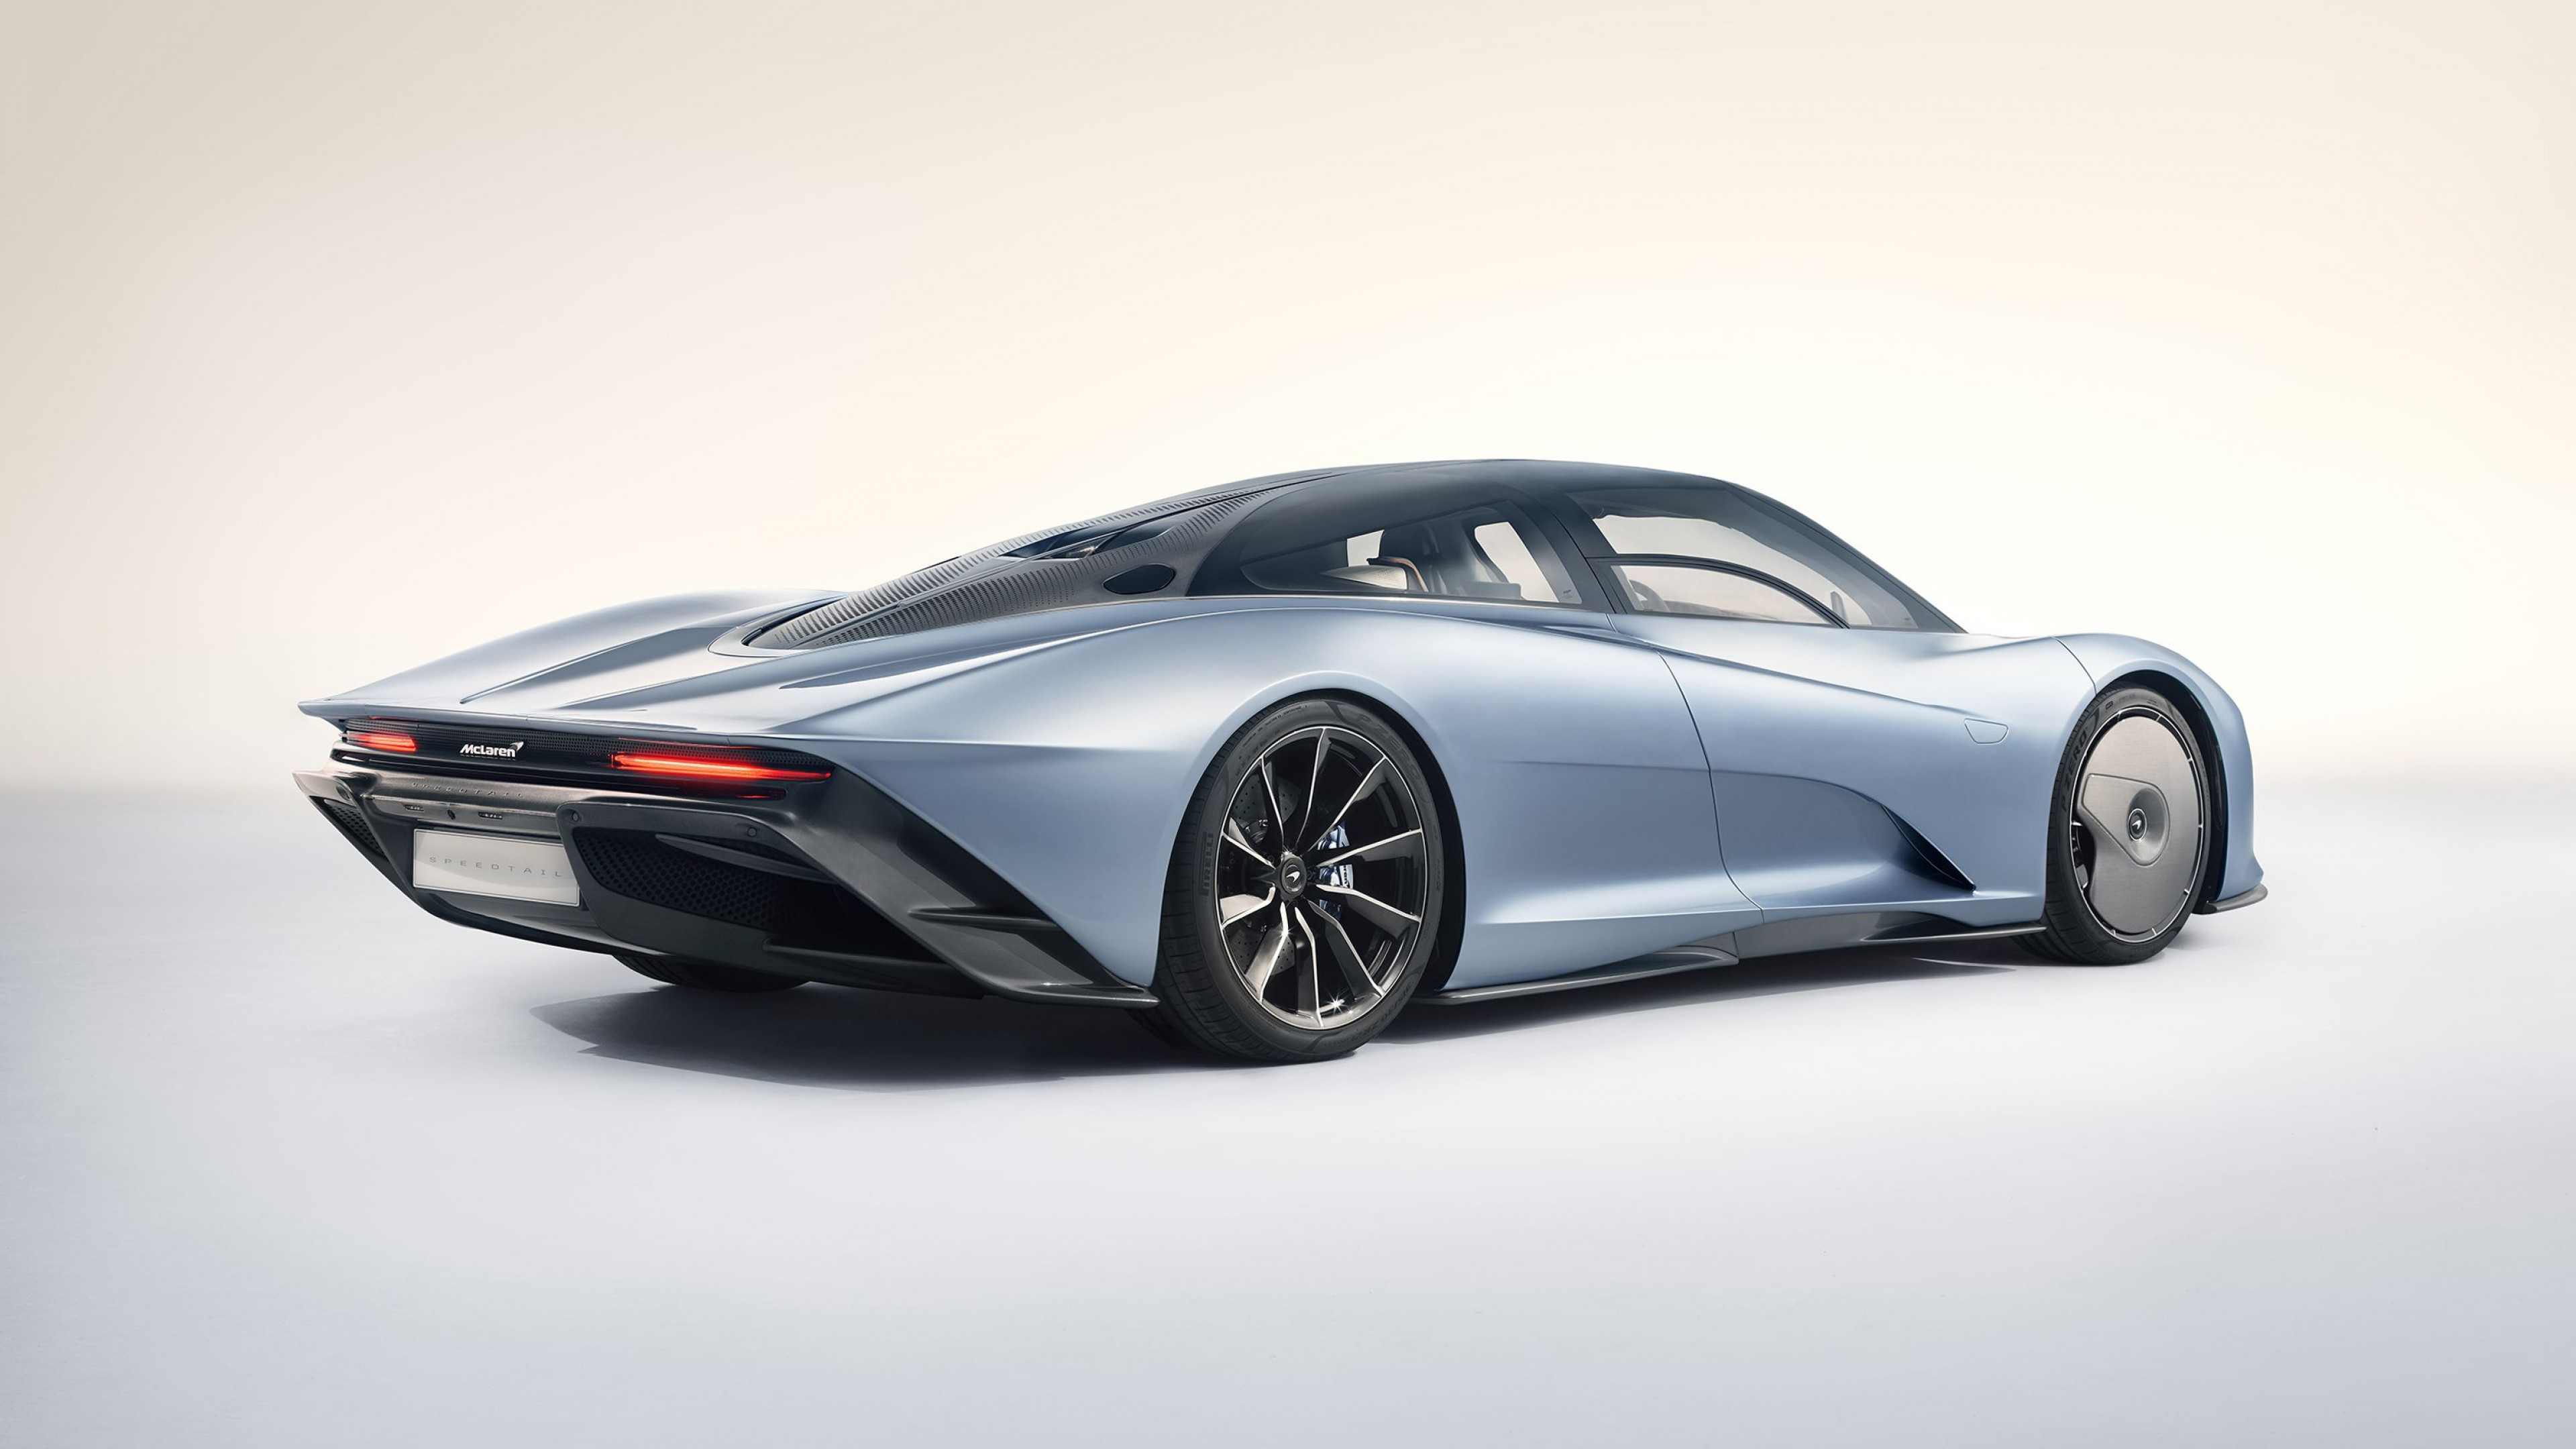 Wallpaper McLaren Speedtail supercar electric cars 4K Cars 3840x2160